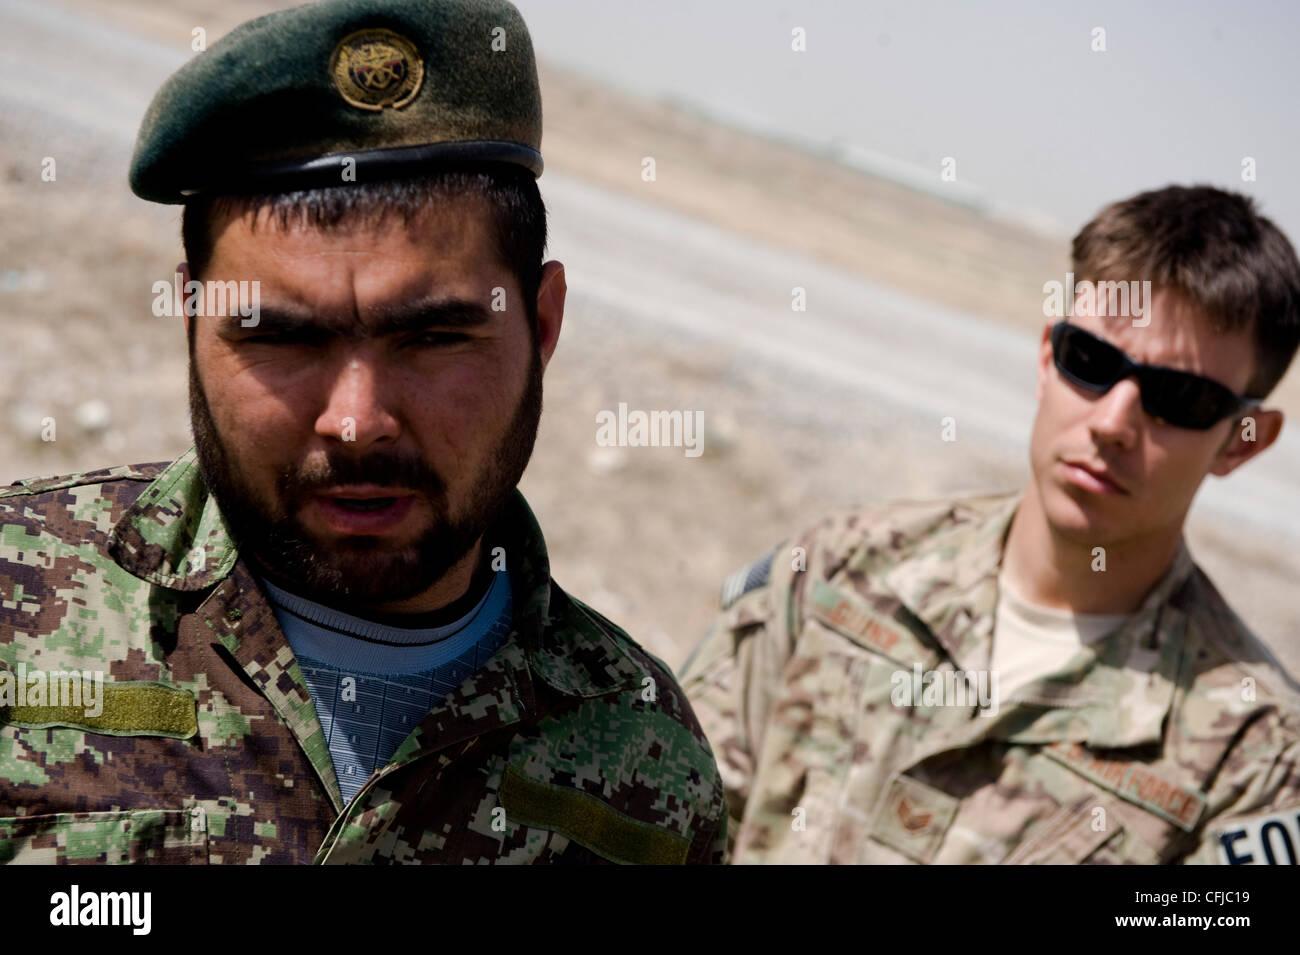 KANDAHAR, Afghanistan - Fakhr Uddin (left), an Afghan National Army soldier, participates in a debrief after practice - Stock Image